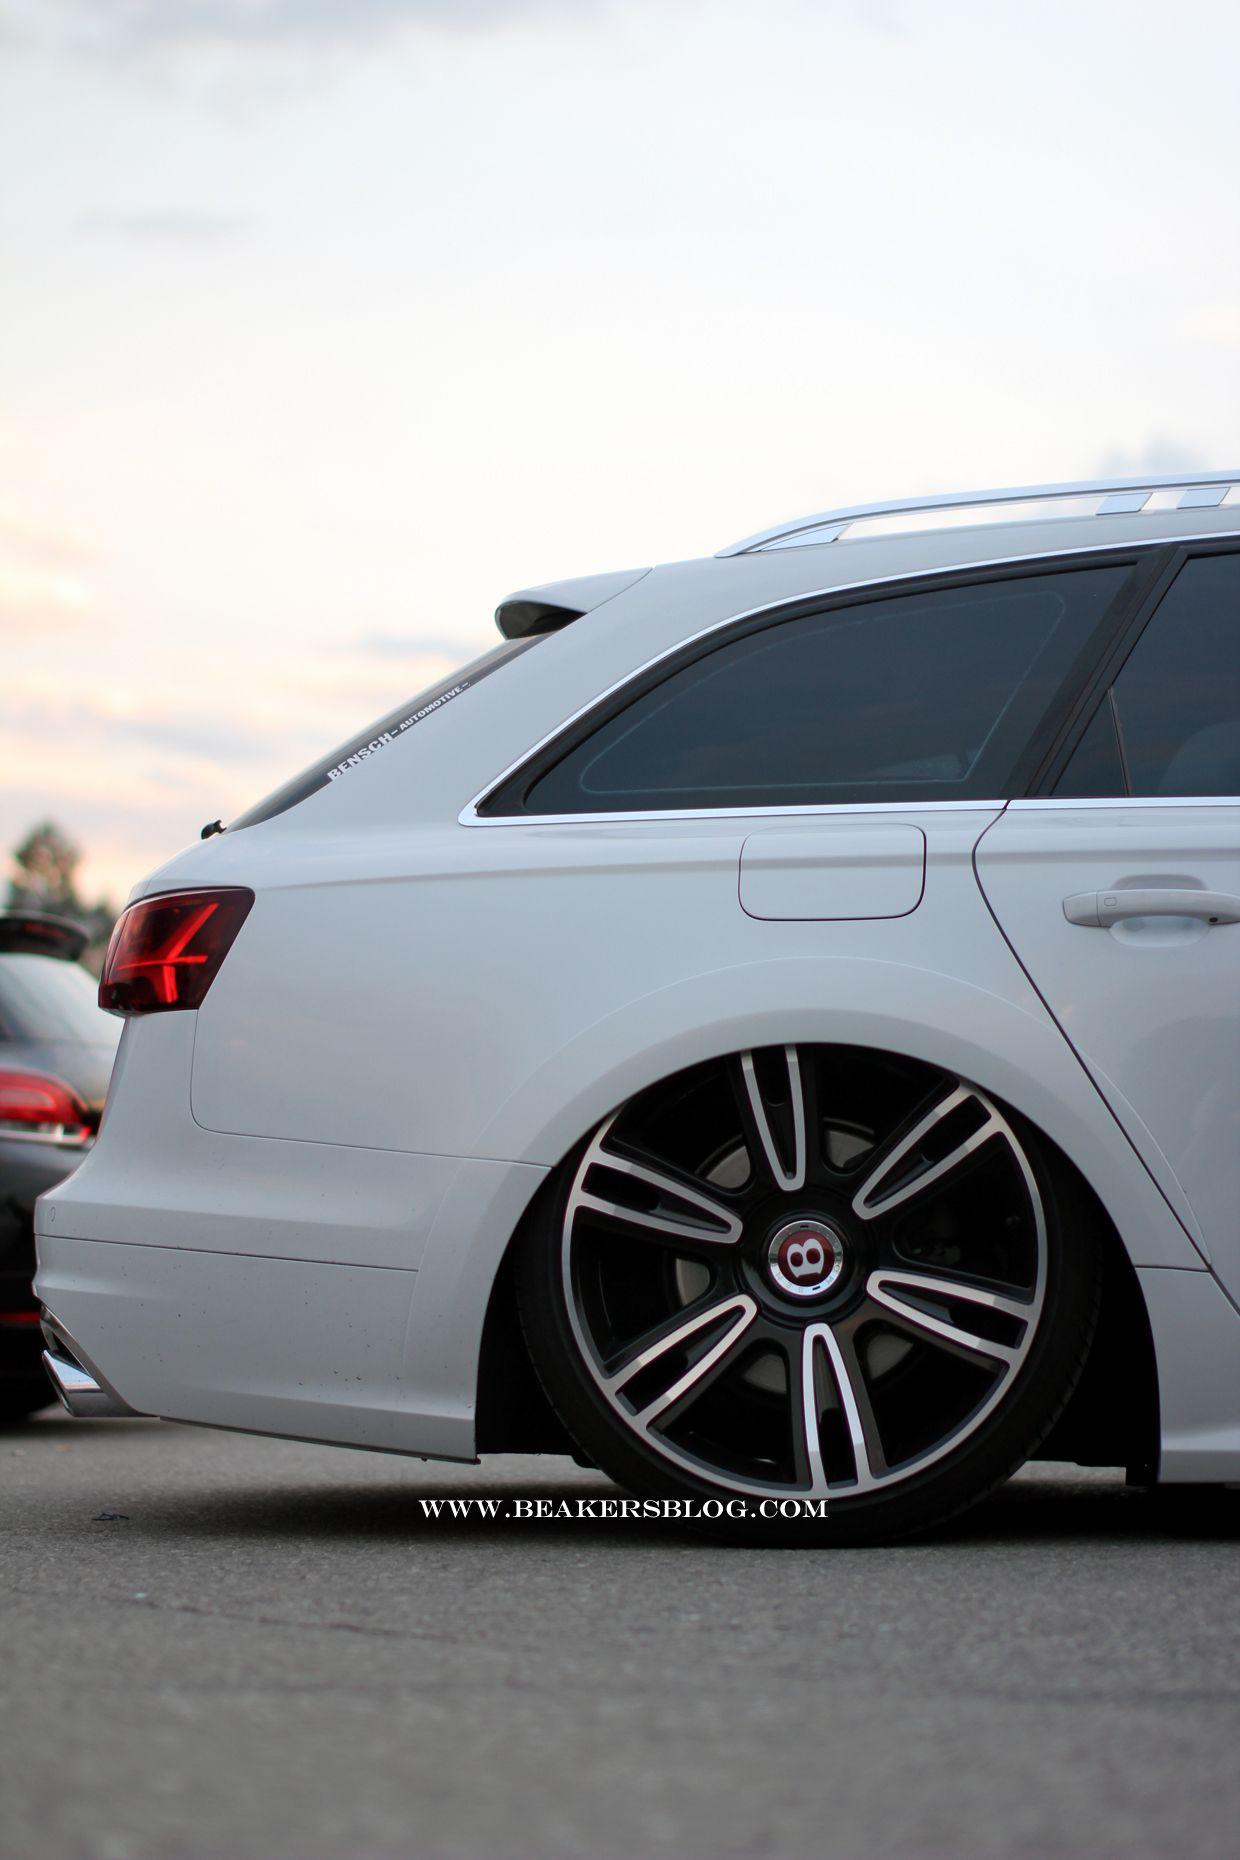 Audi mtm rs6 avant c5 c496824082014224154_2 jpg 1024 682 audi pinterest audi and cars